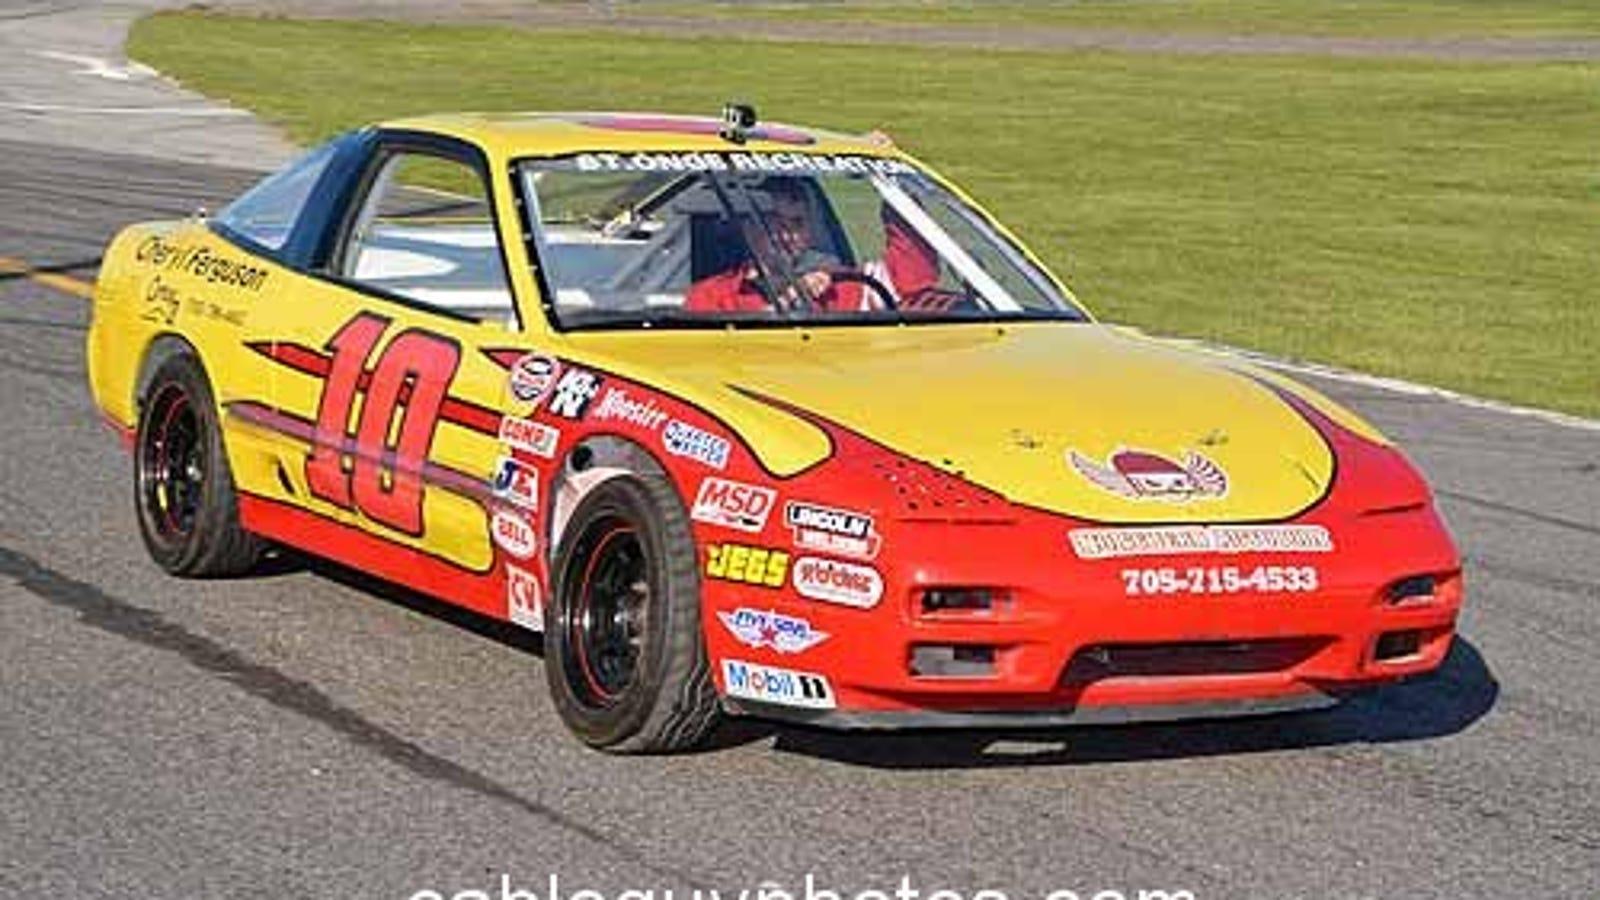 So We Wanna Go 4 Cylinder Stock Car Racing